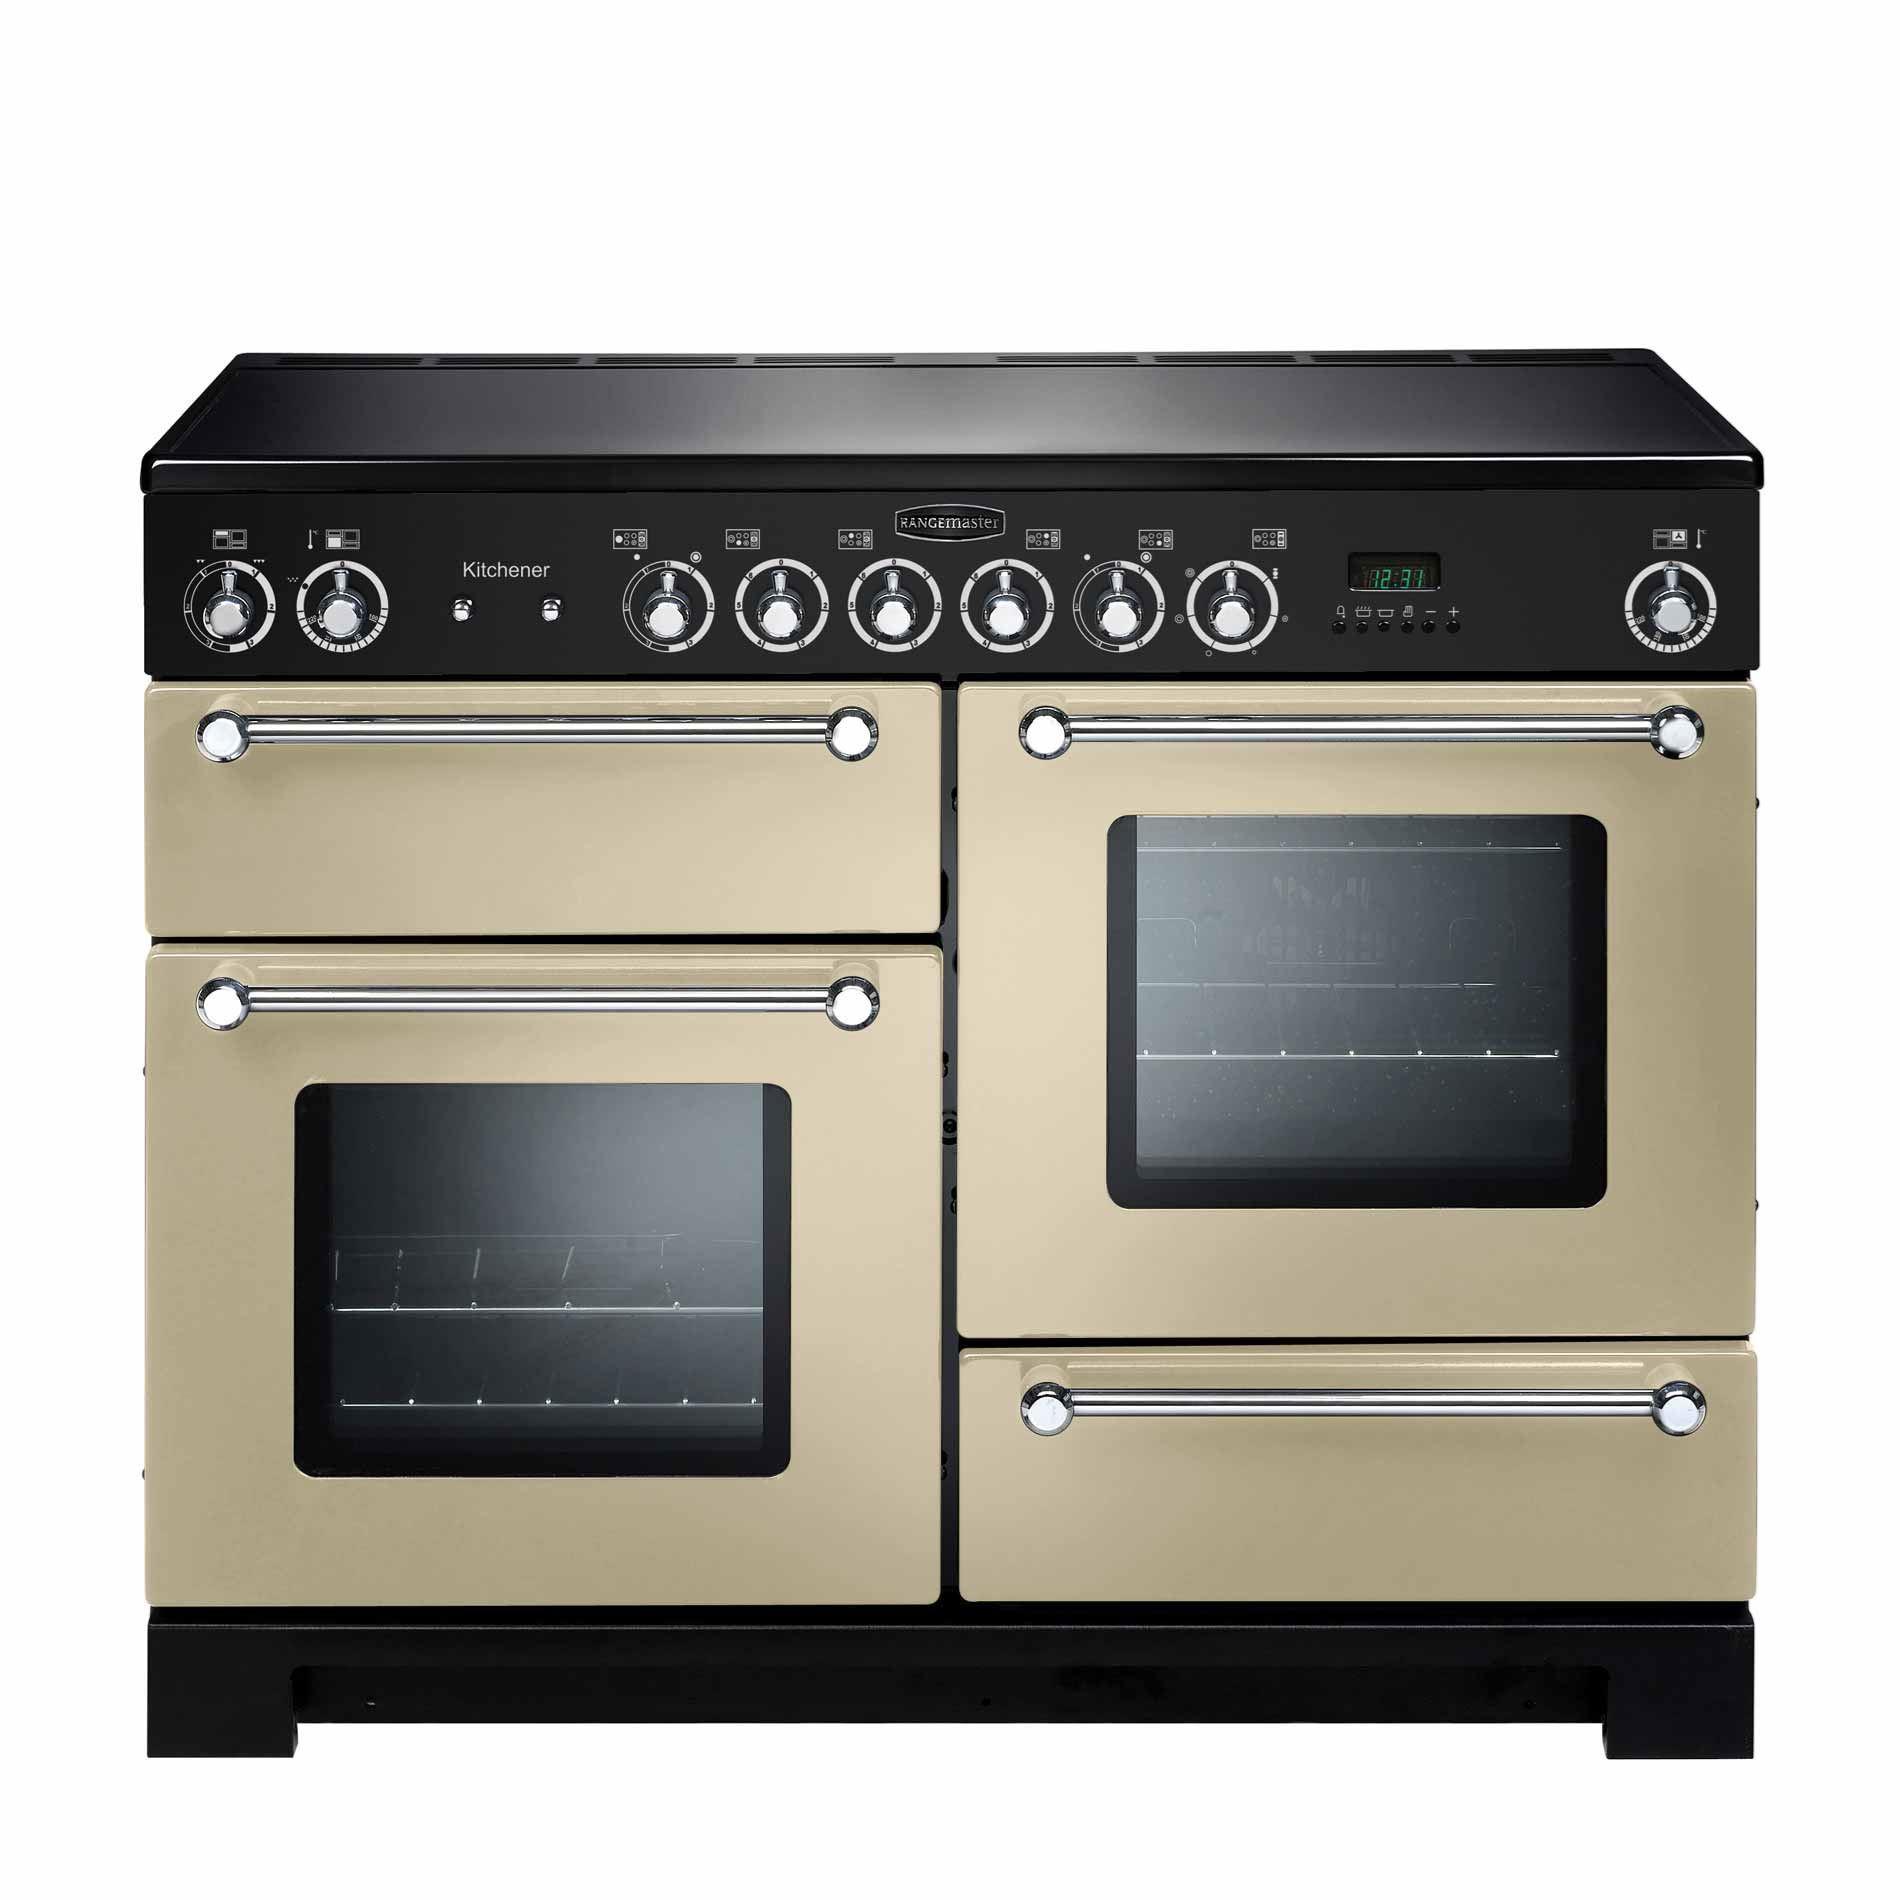 Rangemaster: Kitchener 110 Ceramic Cream Range Cooker - Appliance Source